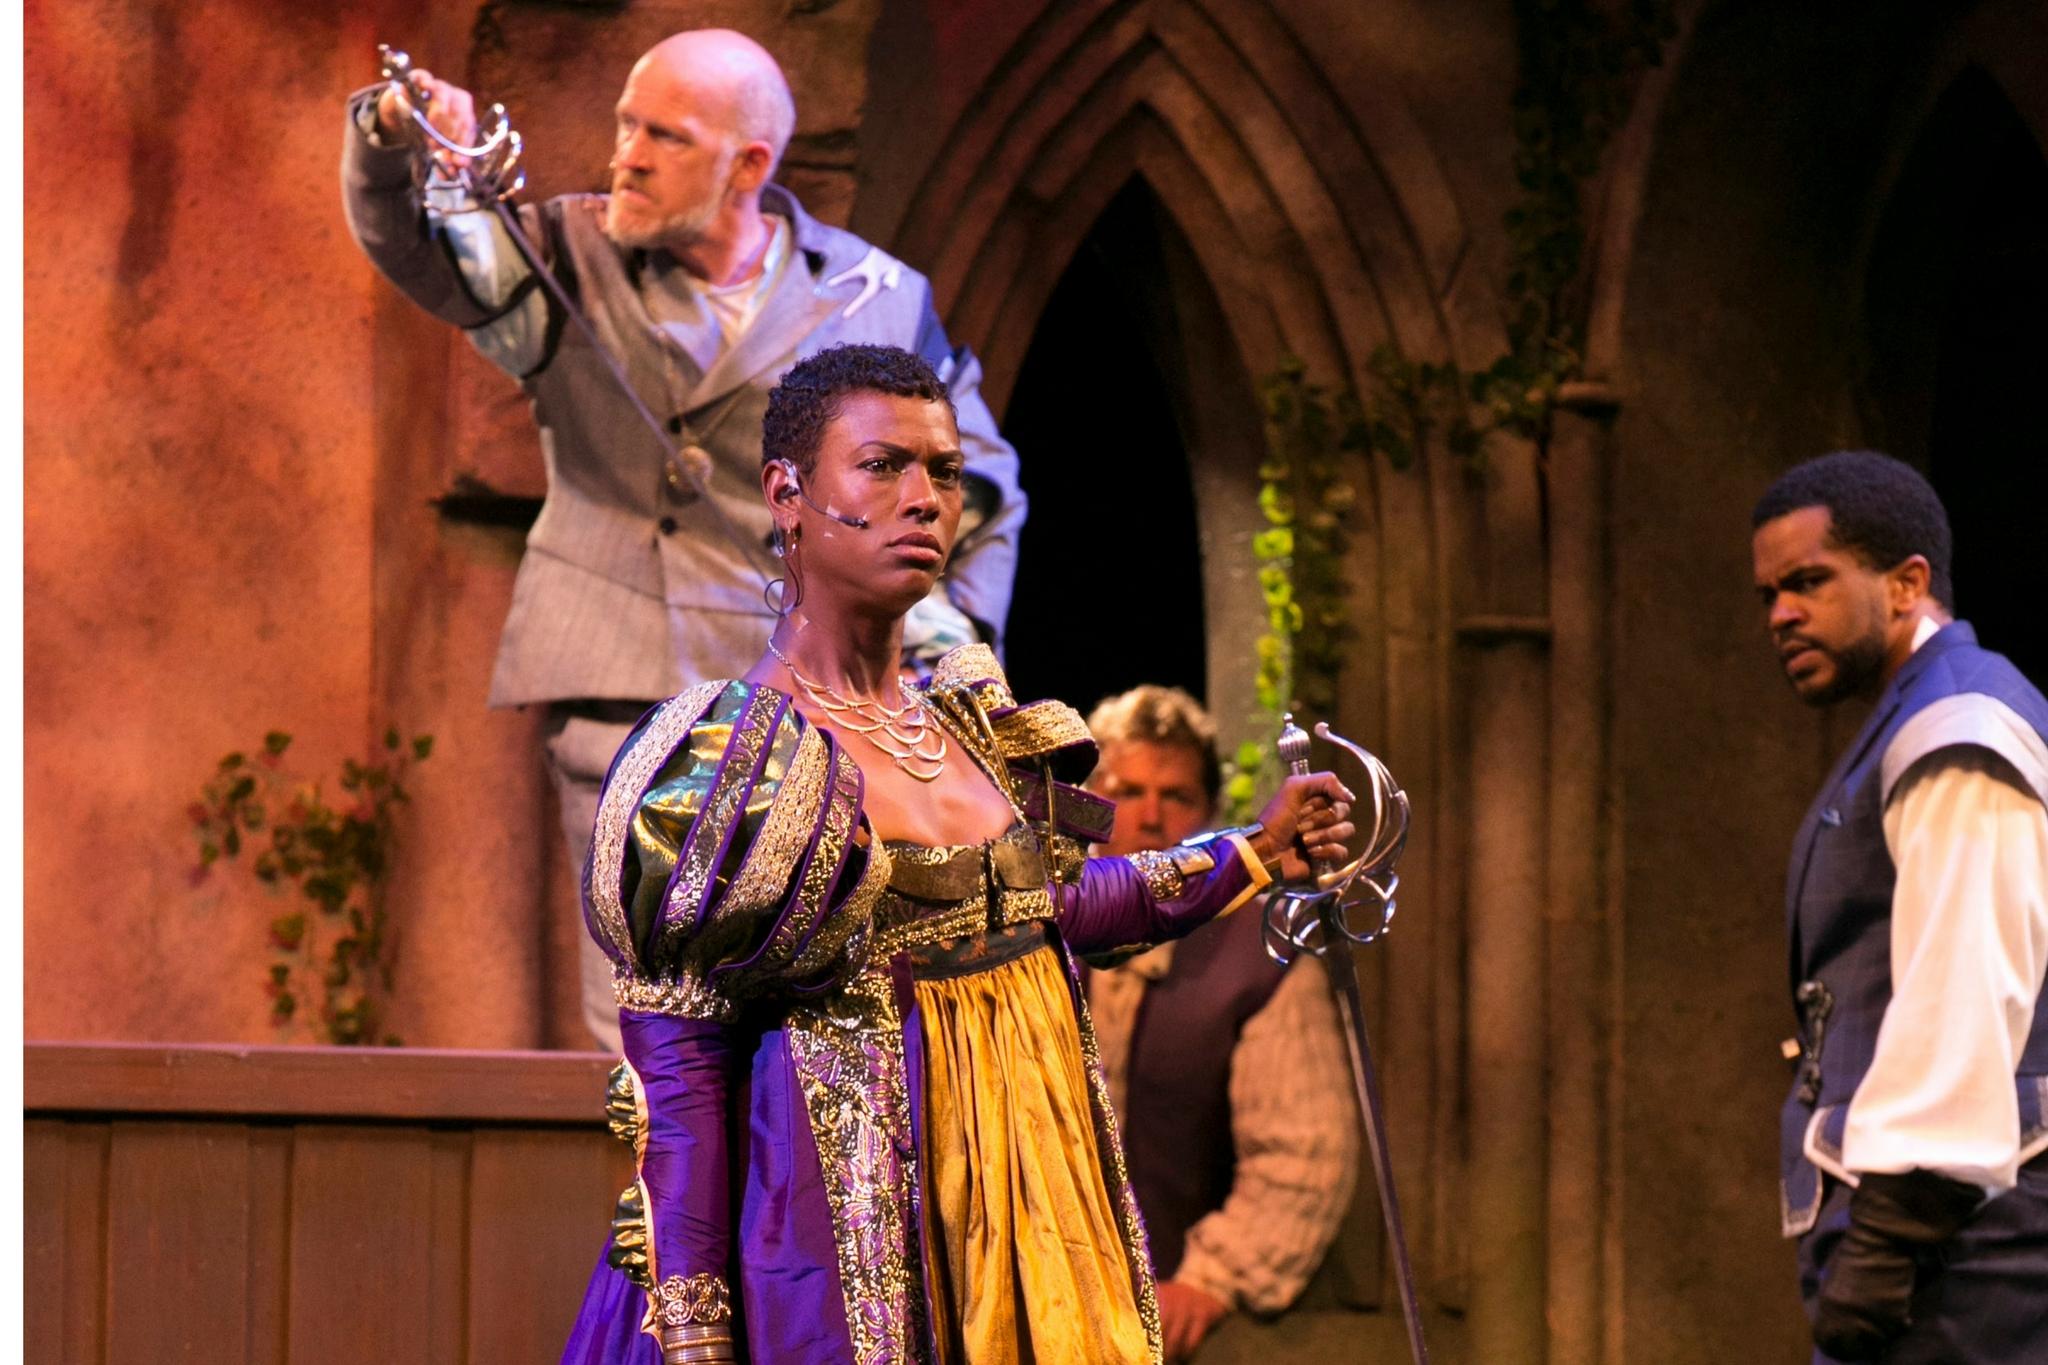 Mark Soucy (Lord Montegue), Kaci Hamilton (Prince Escalus), Adam Ewer (Paris), and Brandon G. Green (Benvolio) in Romeo & Juliet, Shakespeare on the Common 2017-Photo by Evgenia Eliseeva